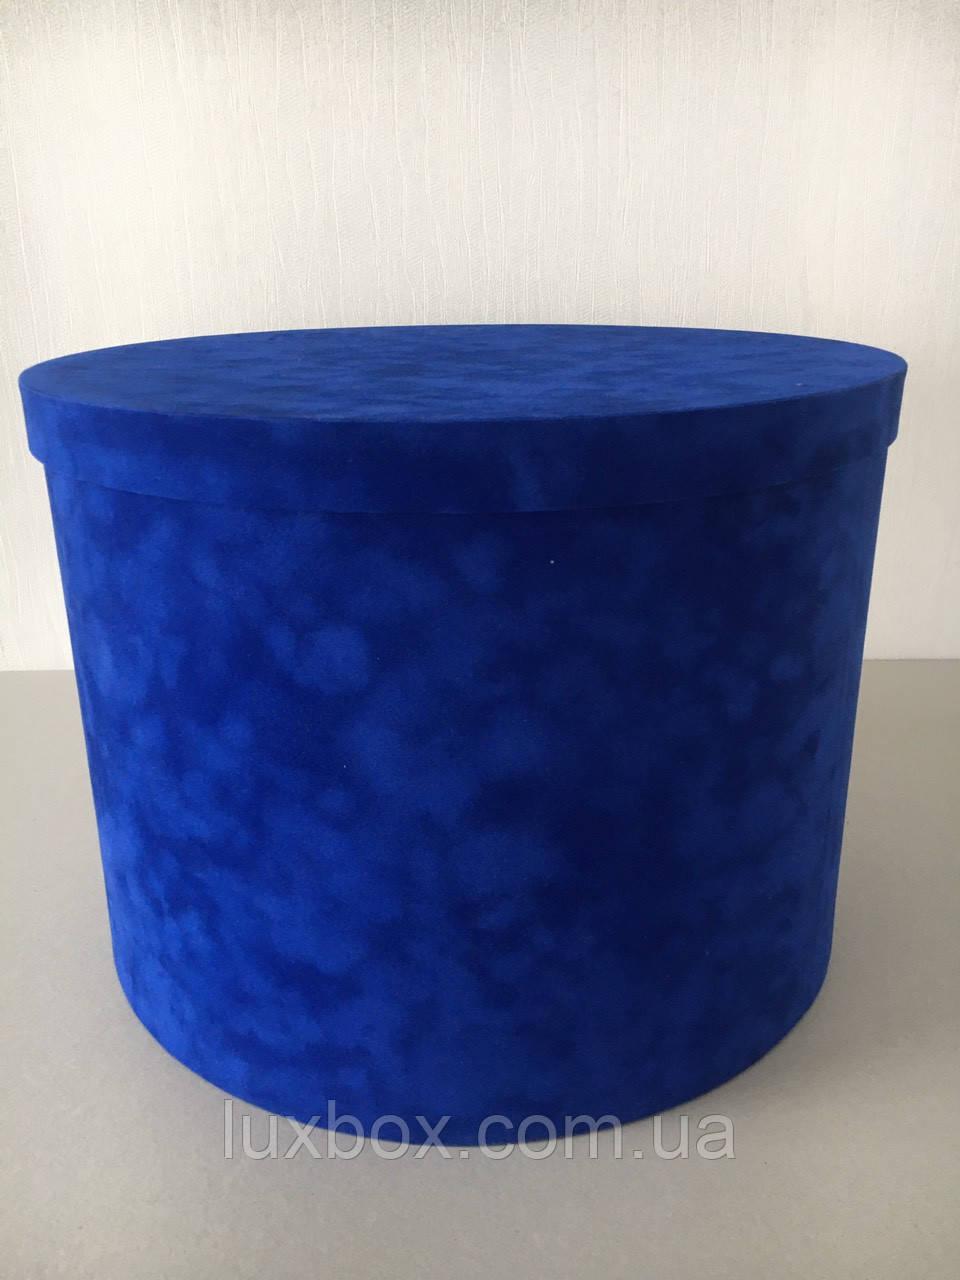 Шляпна коробка Велюрова(бархатна коробка) h30/d40